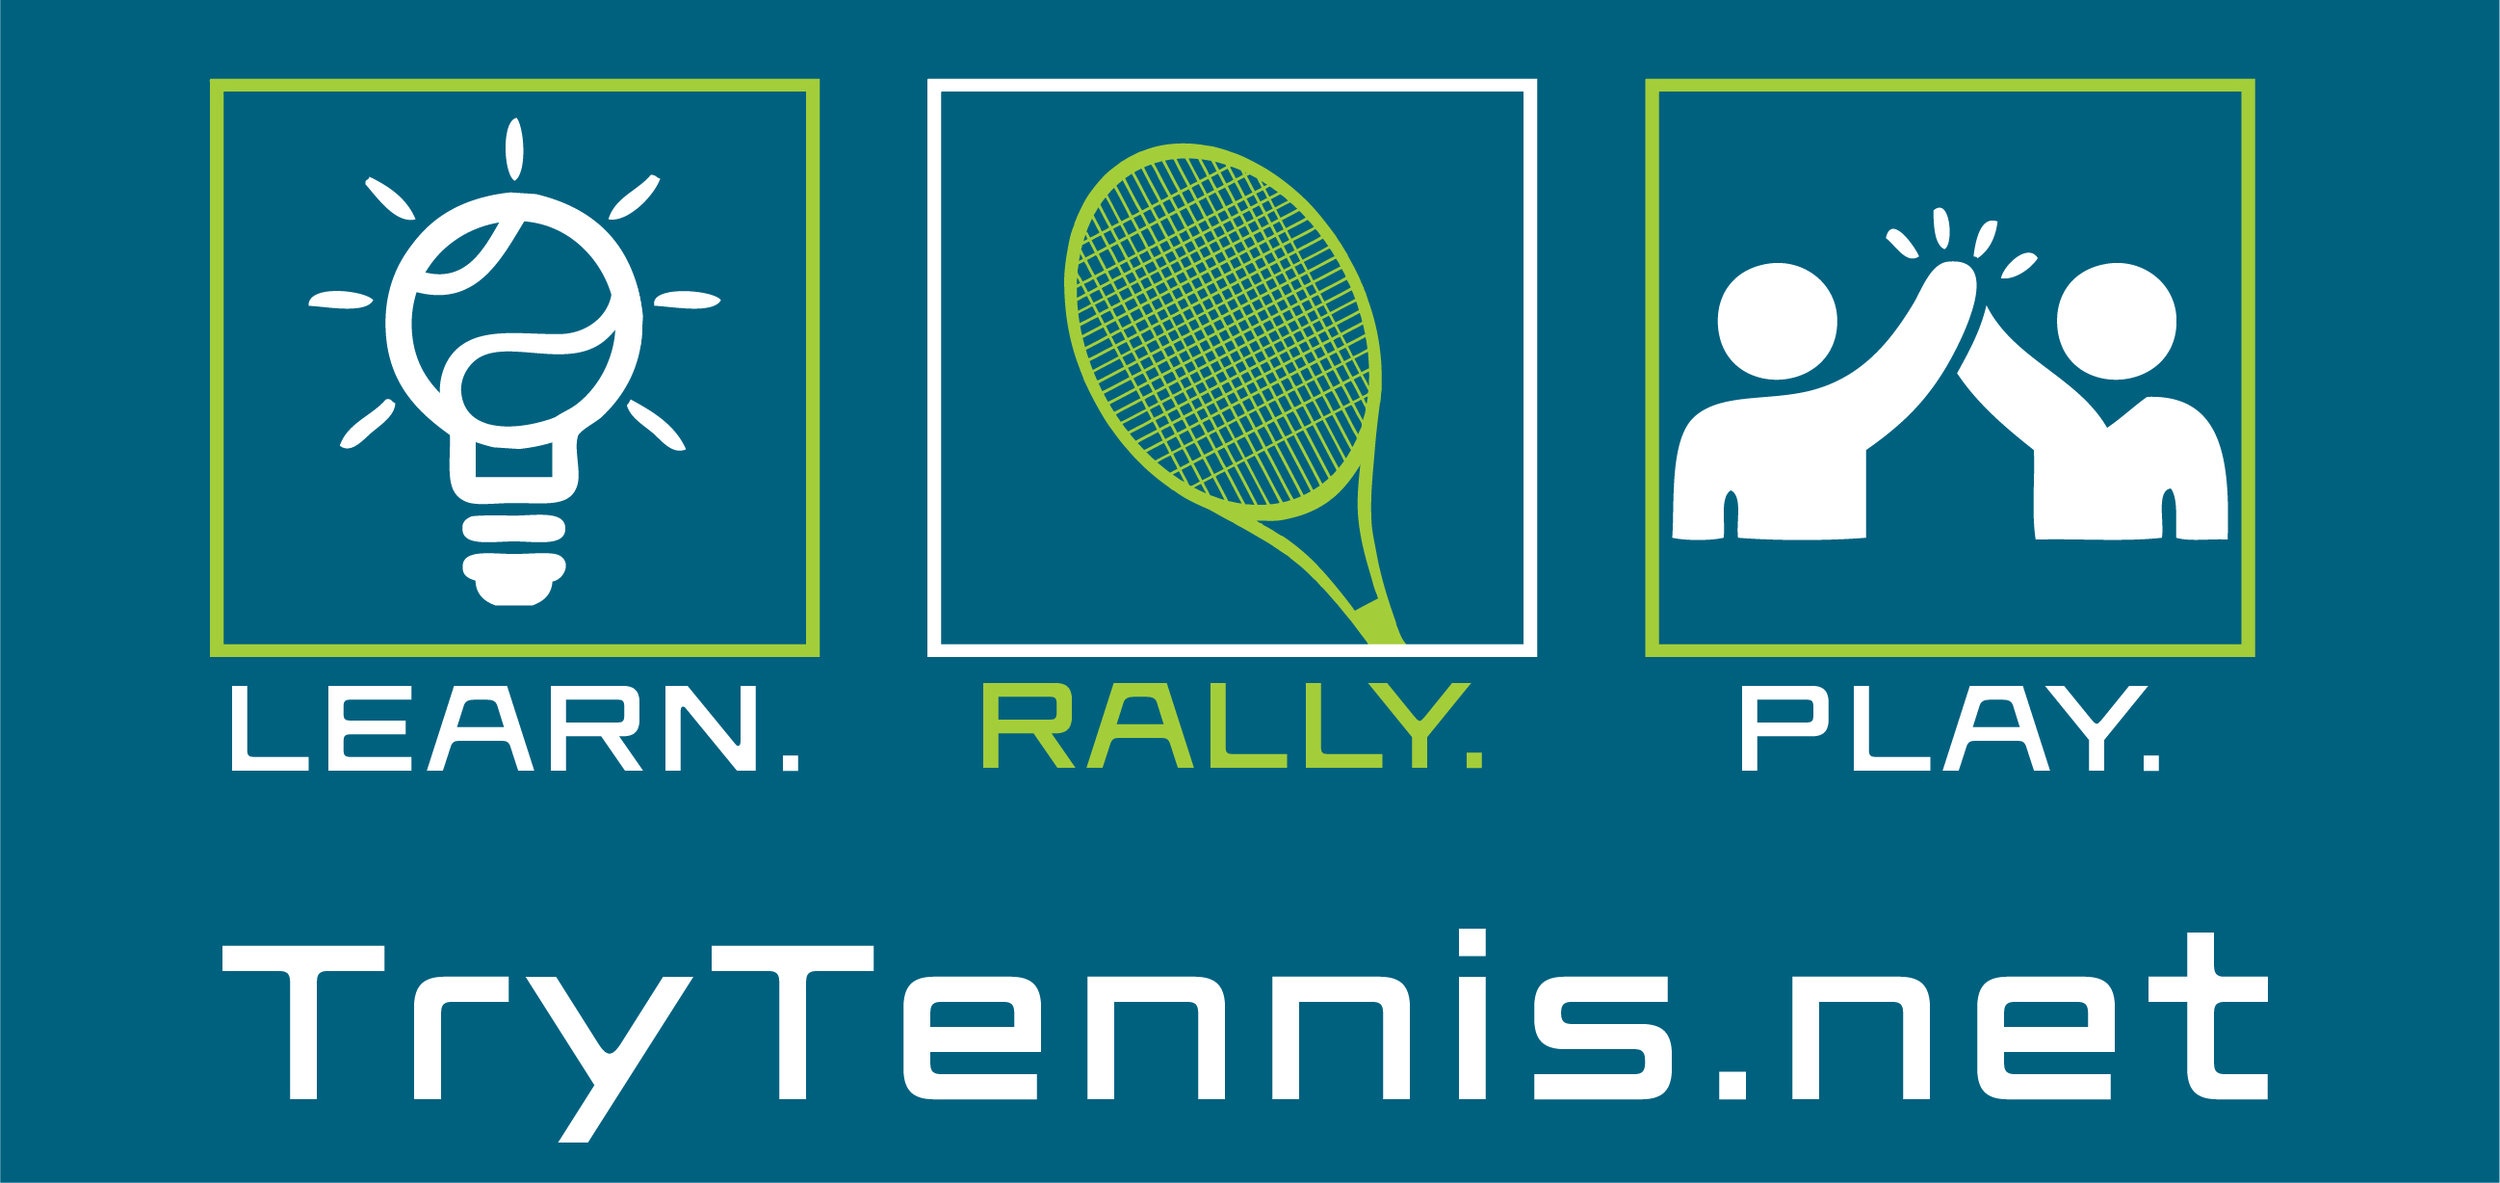 Try_Tennis_Learn_Rally_Play.jpg